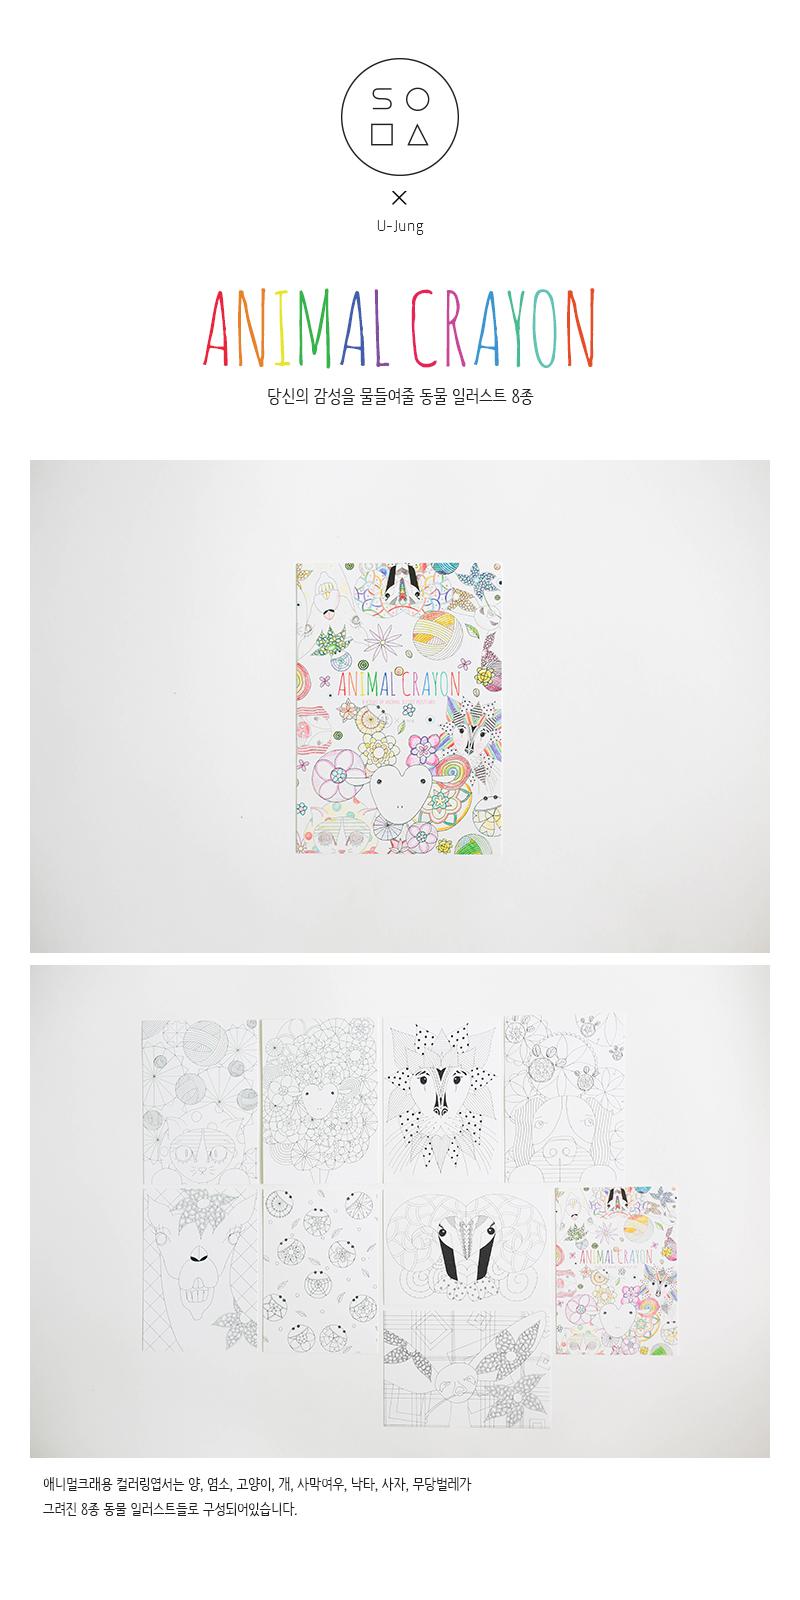 SOMA ANIMAL CRAYON 컬러링엽서set - 소마, 3,000원, 엽서, 엽서세트